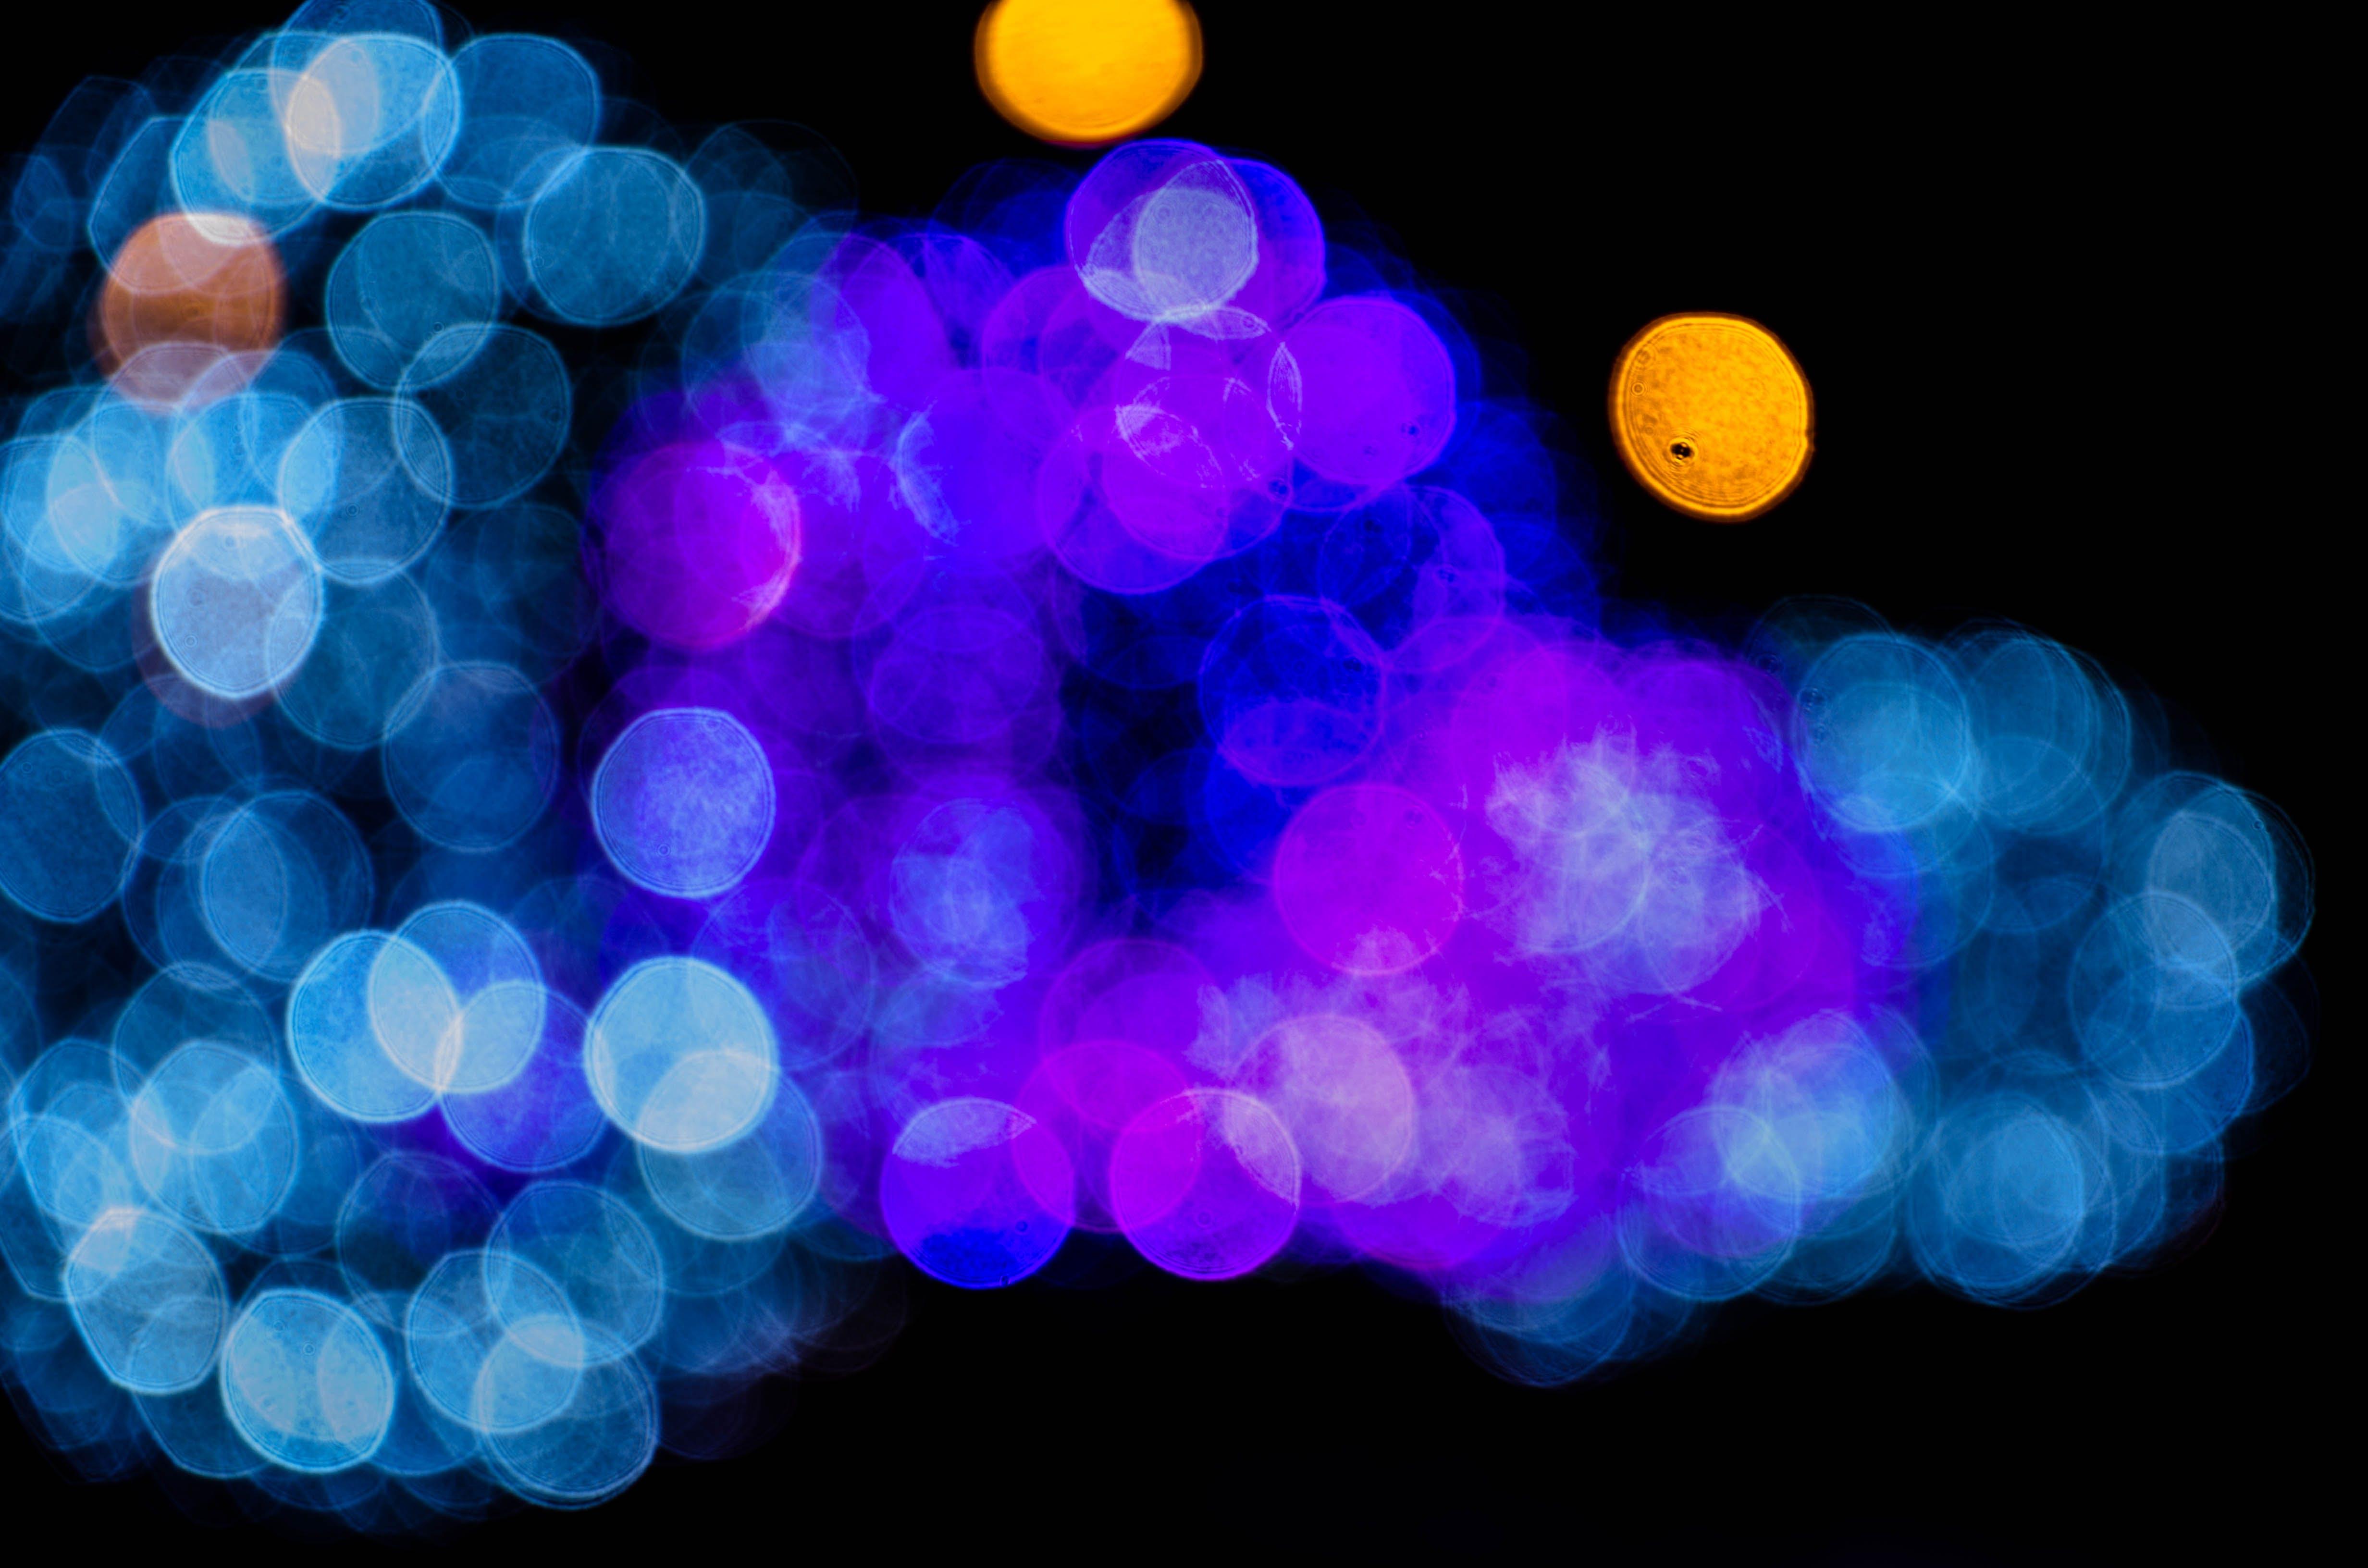 blurred, bokeh, illuminated